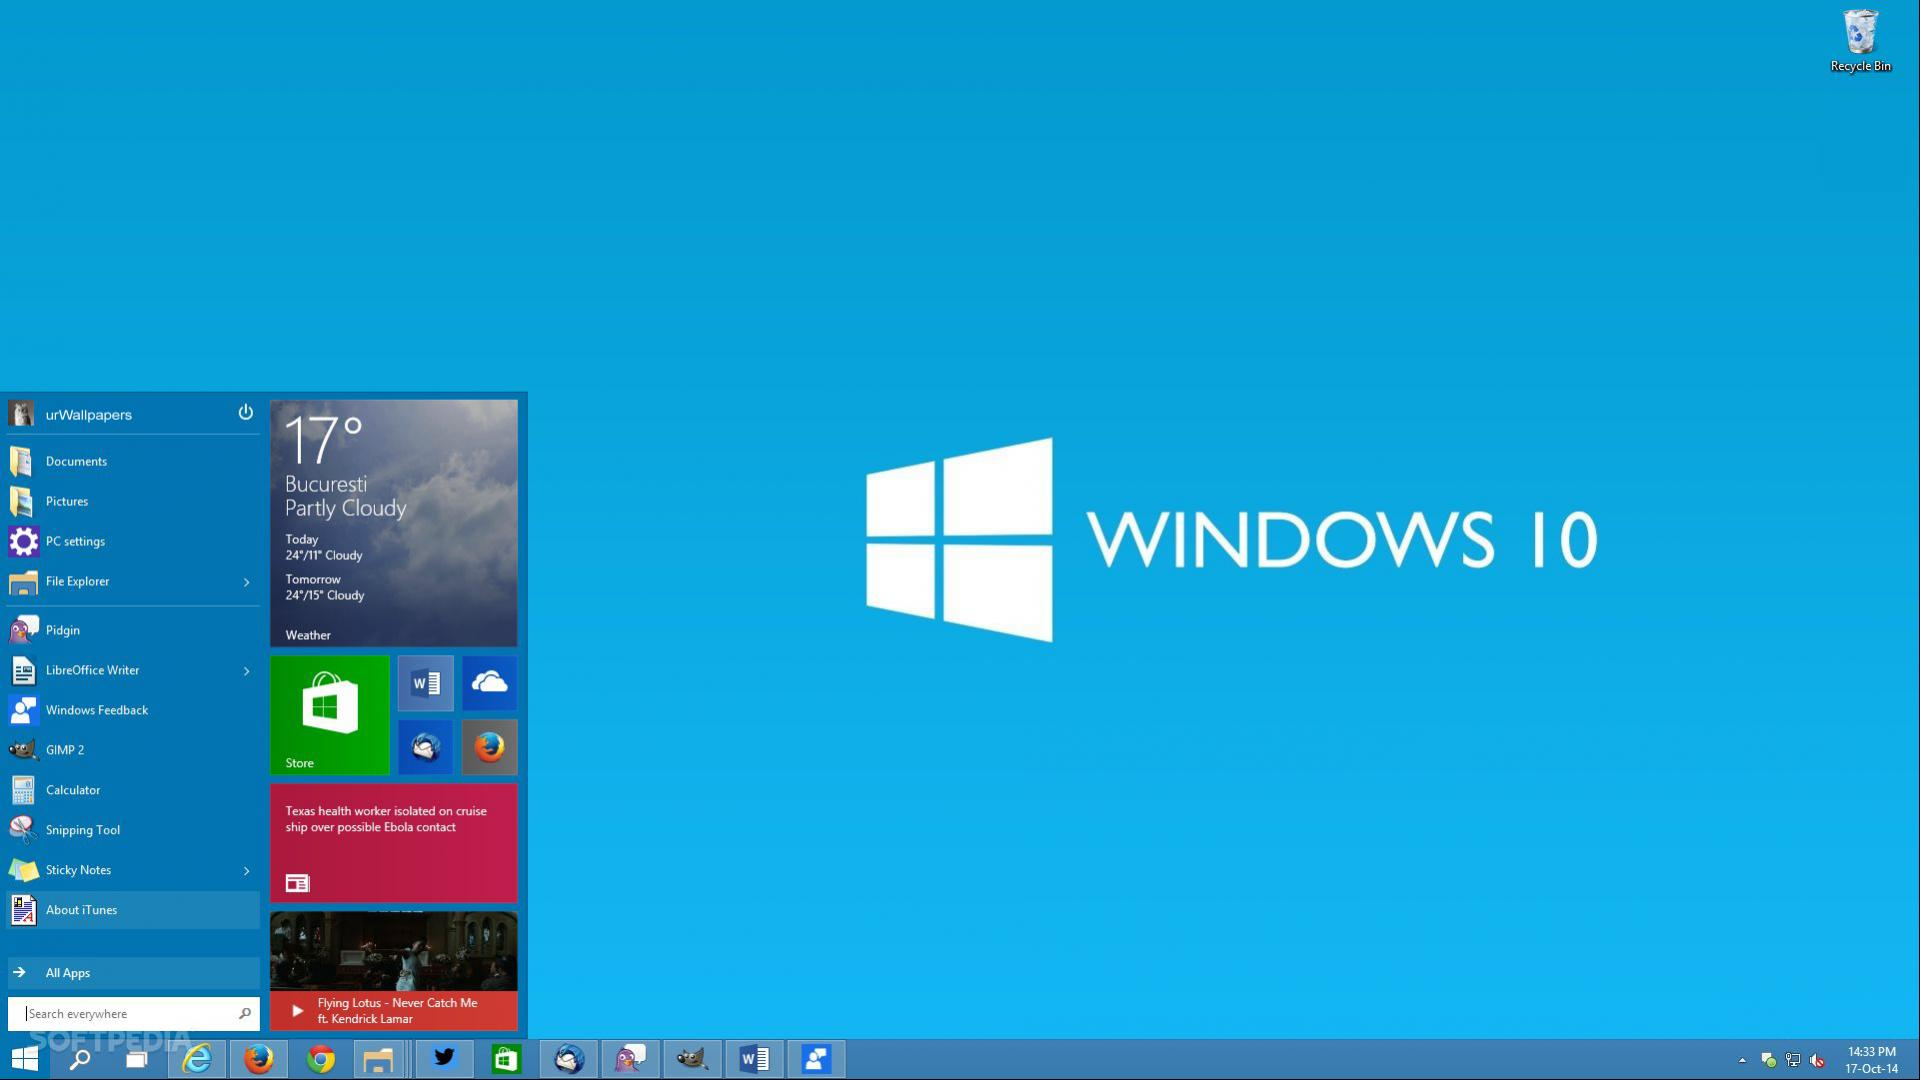 download Windows 10 Microsoft Operating System fake desktop 1920x1080